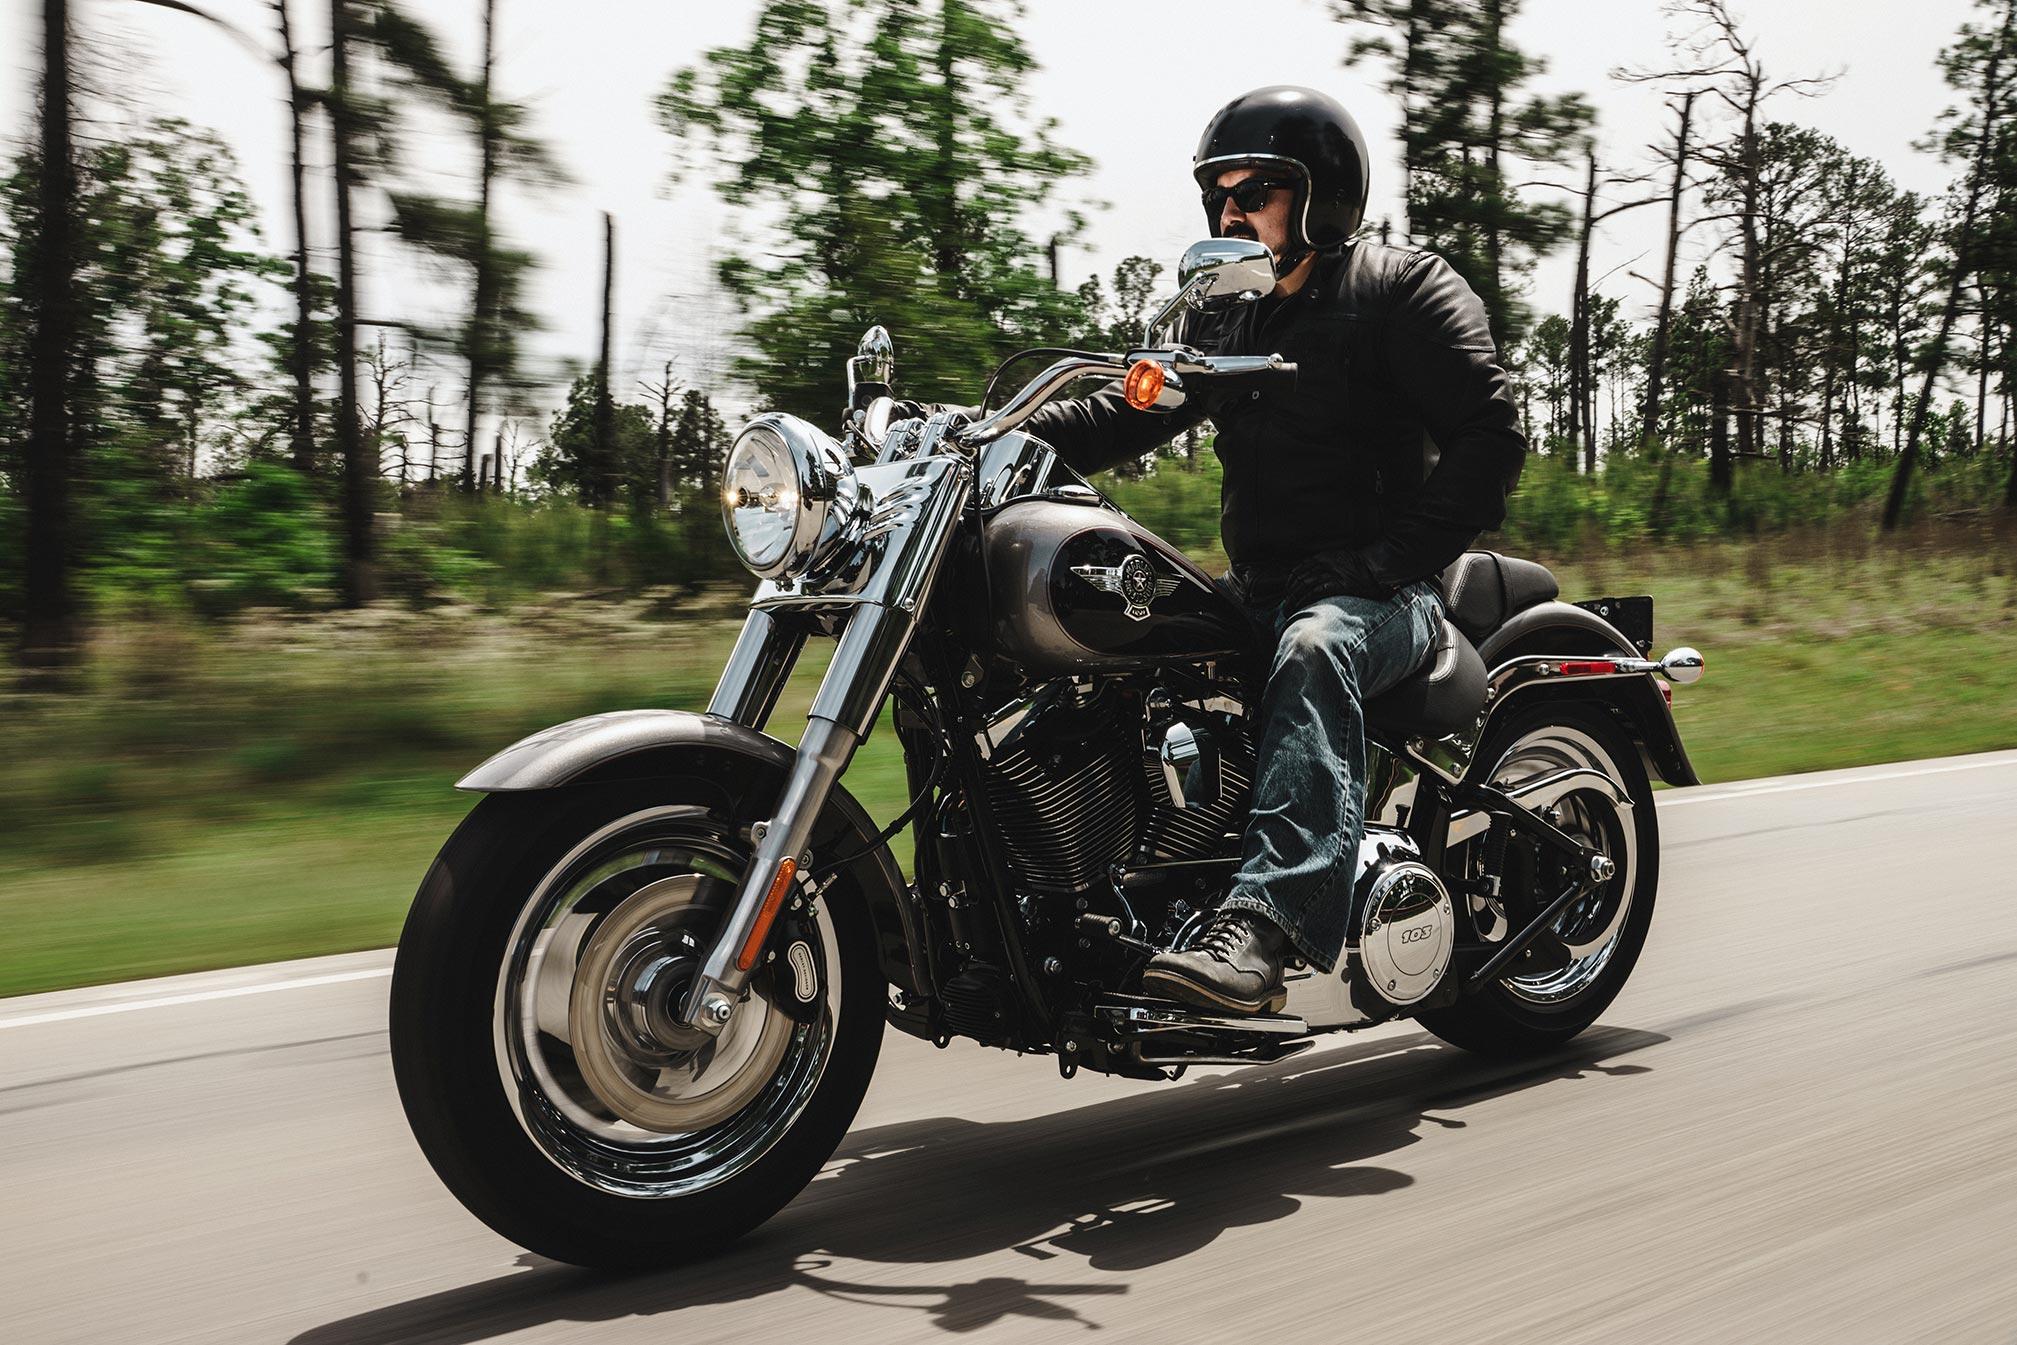 2017 Harley Davidson Fat Boy Papel De Parede Hd Plano De Fundo 2017x1345 Id 758429 Wallpaper Abyss